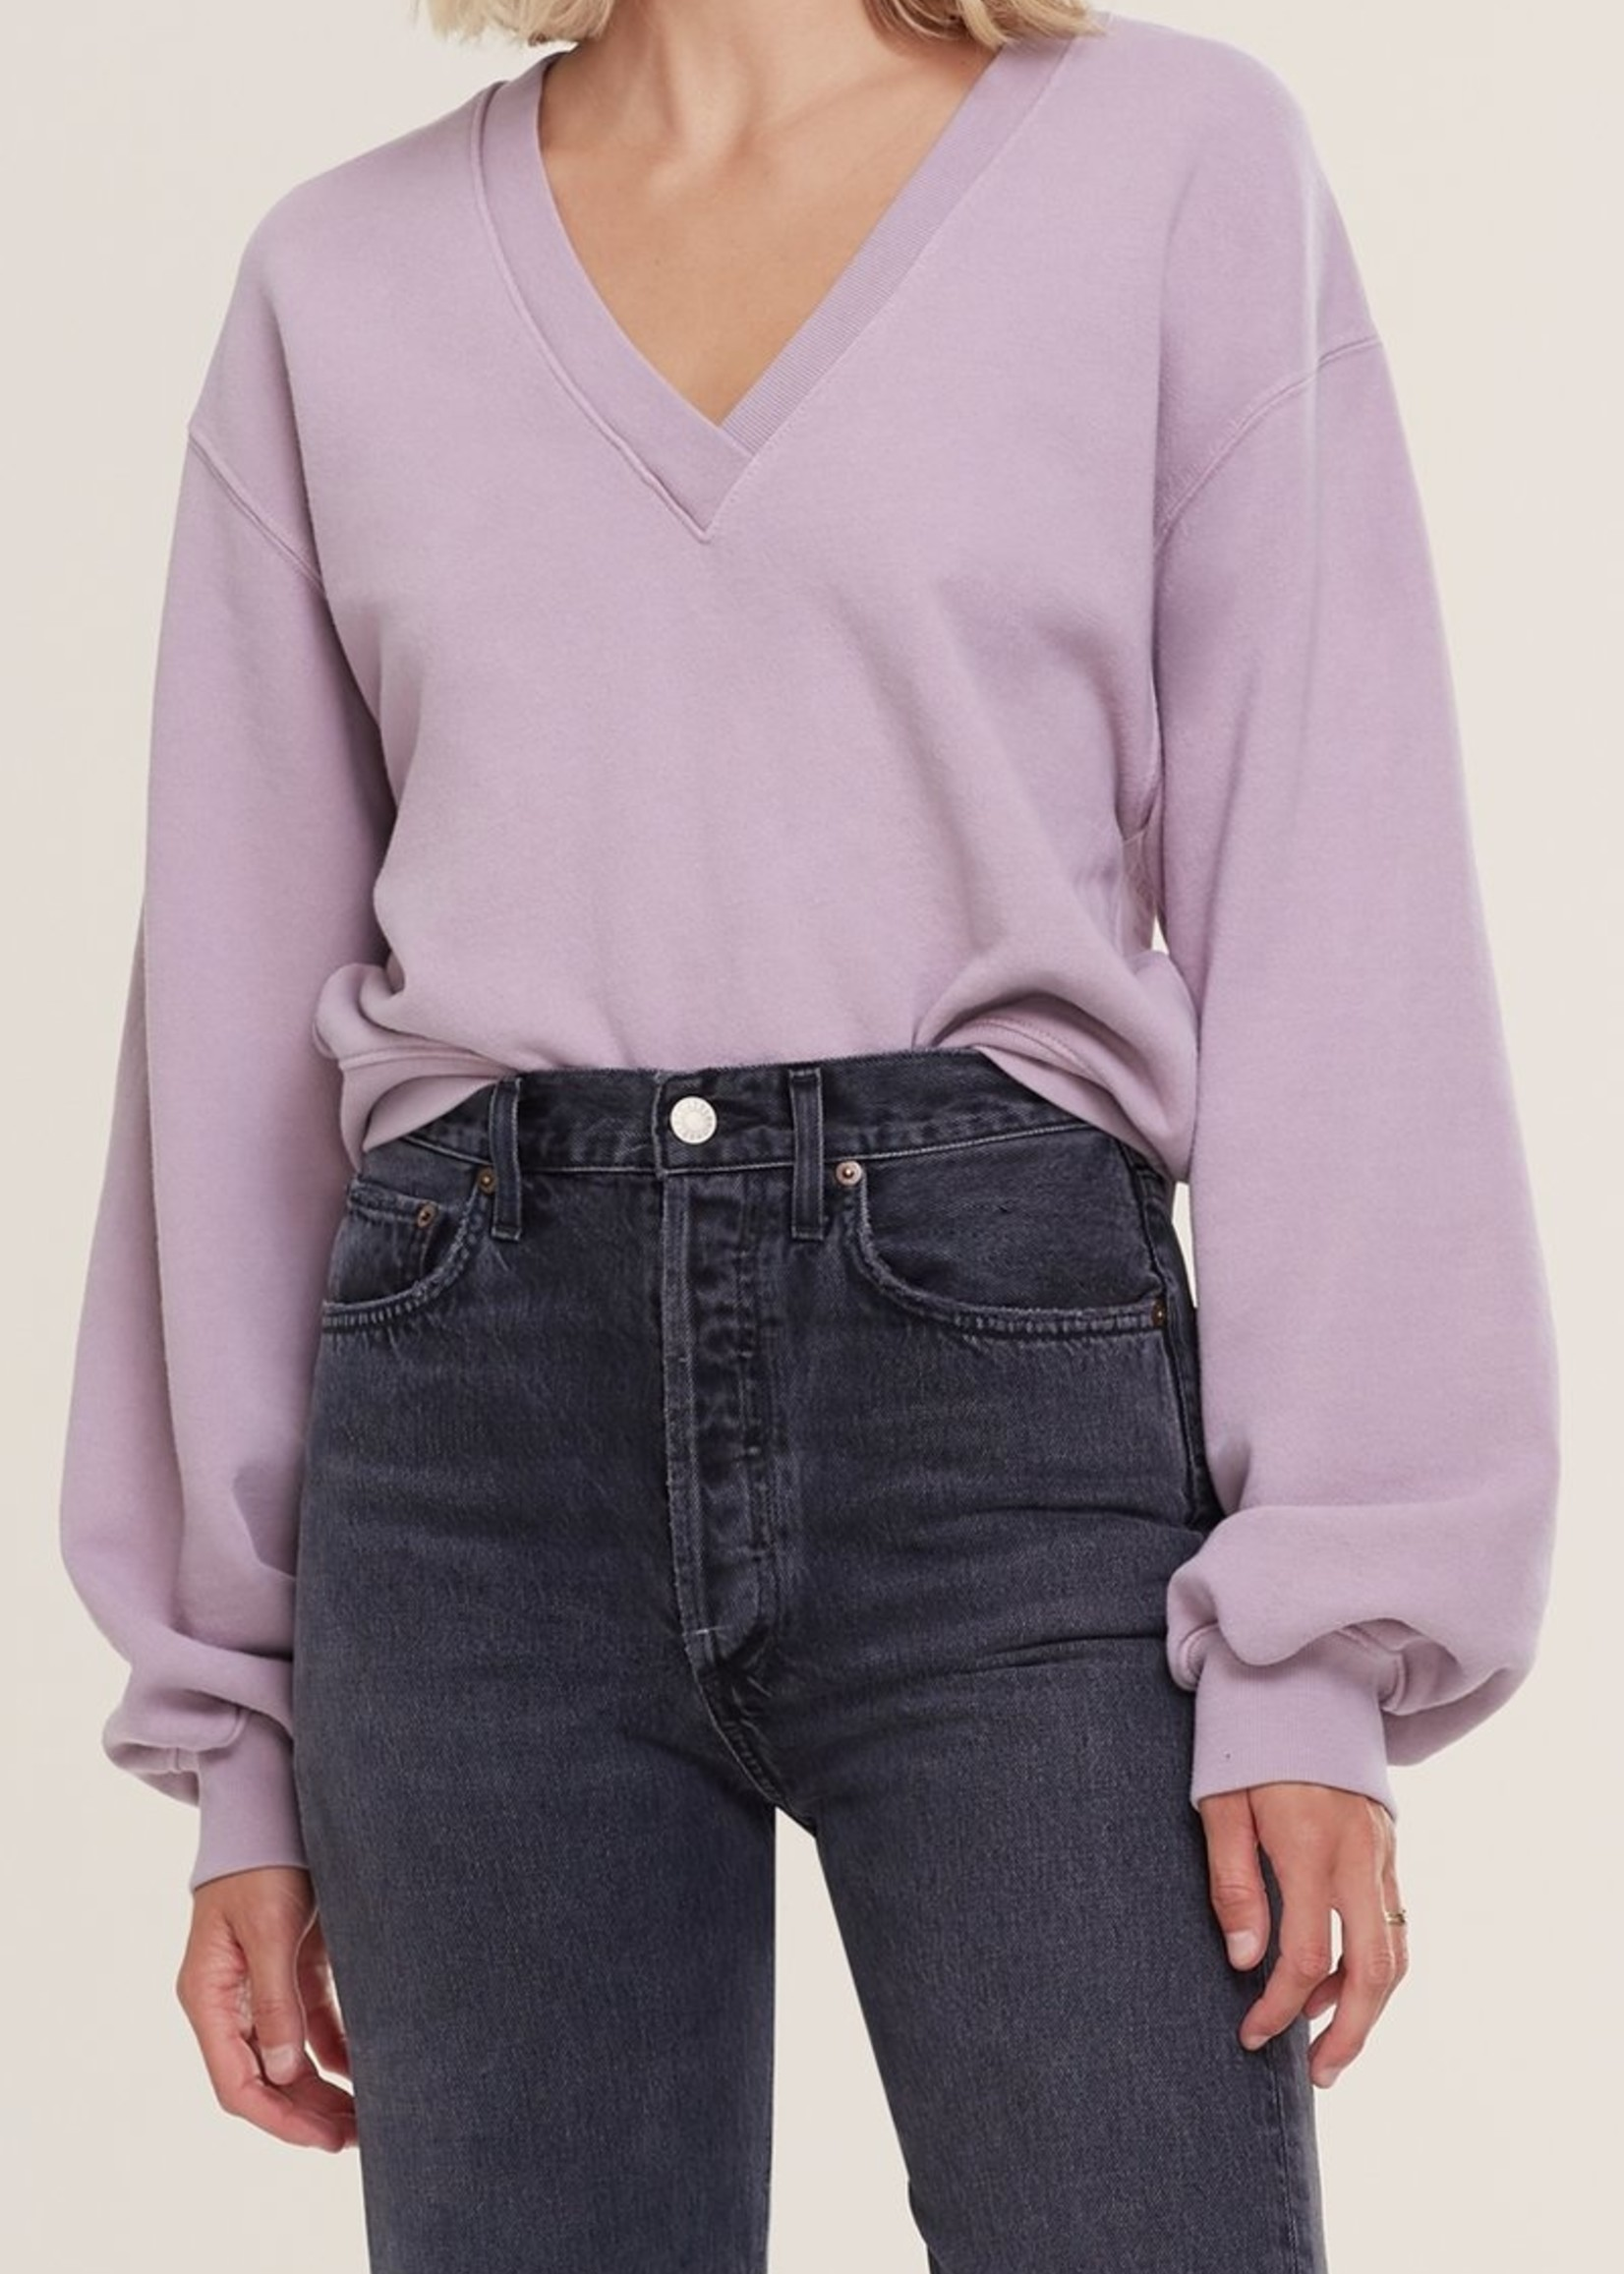 Elitaire Boutique Balloon Sleeve Sweatshirt in Taro